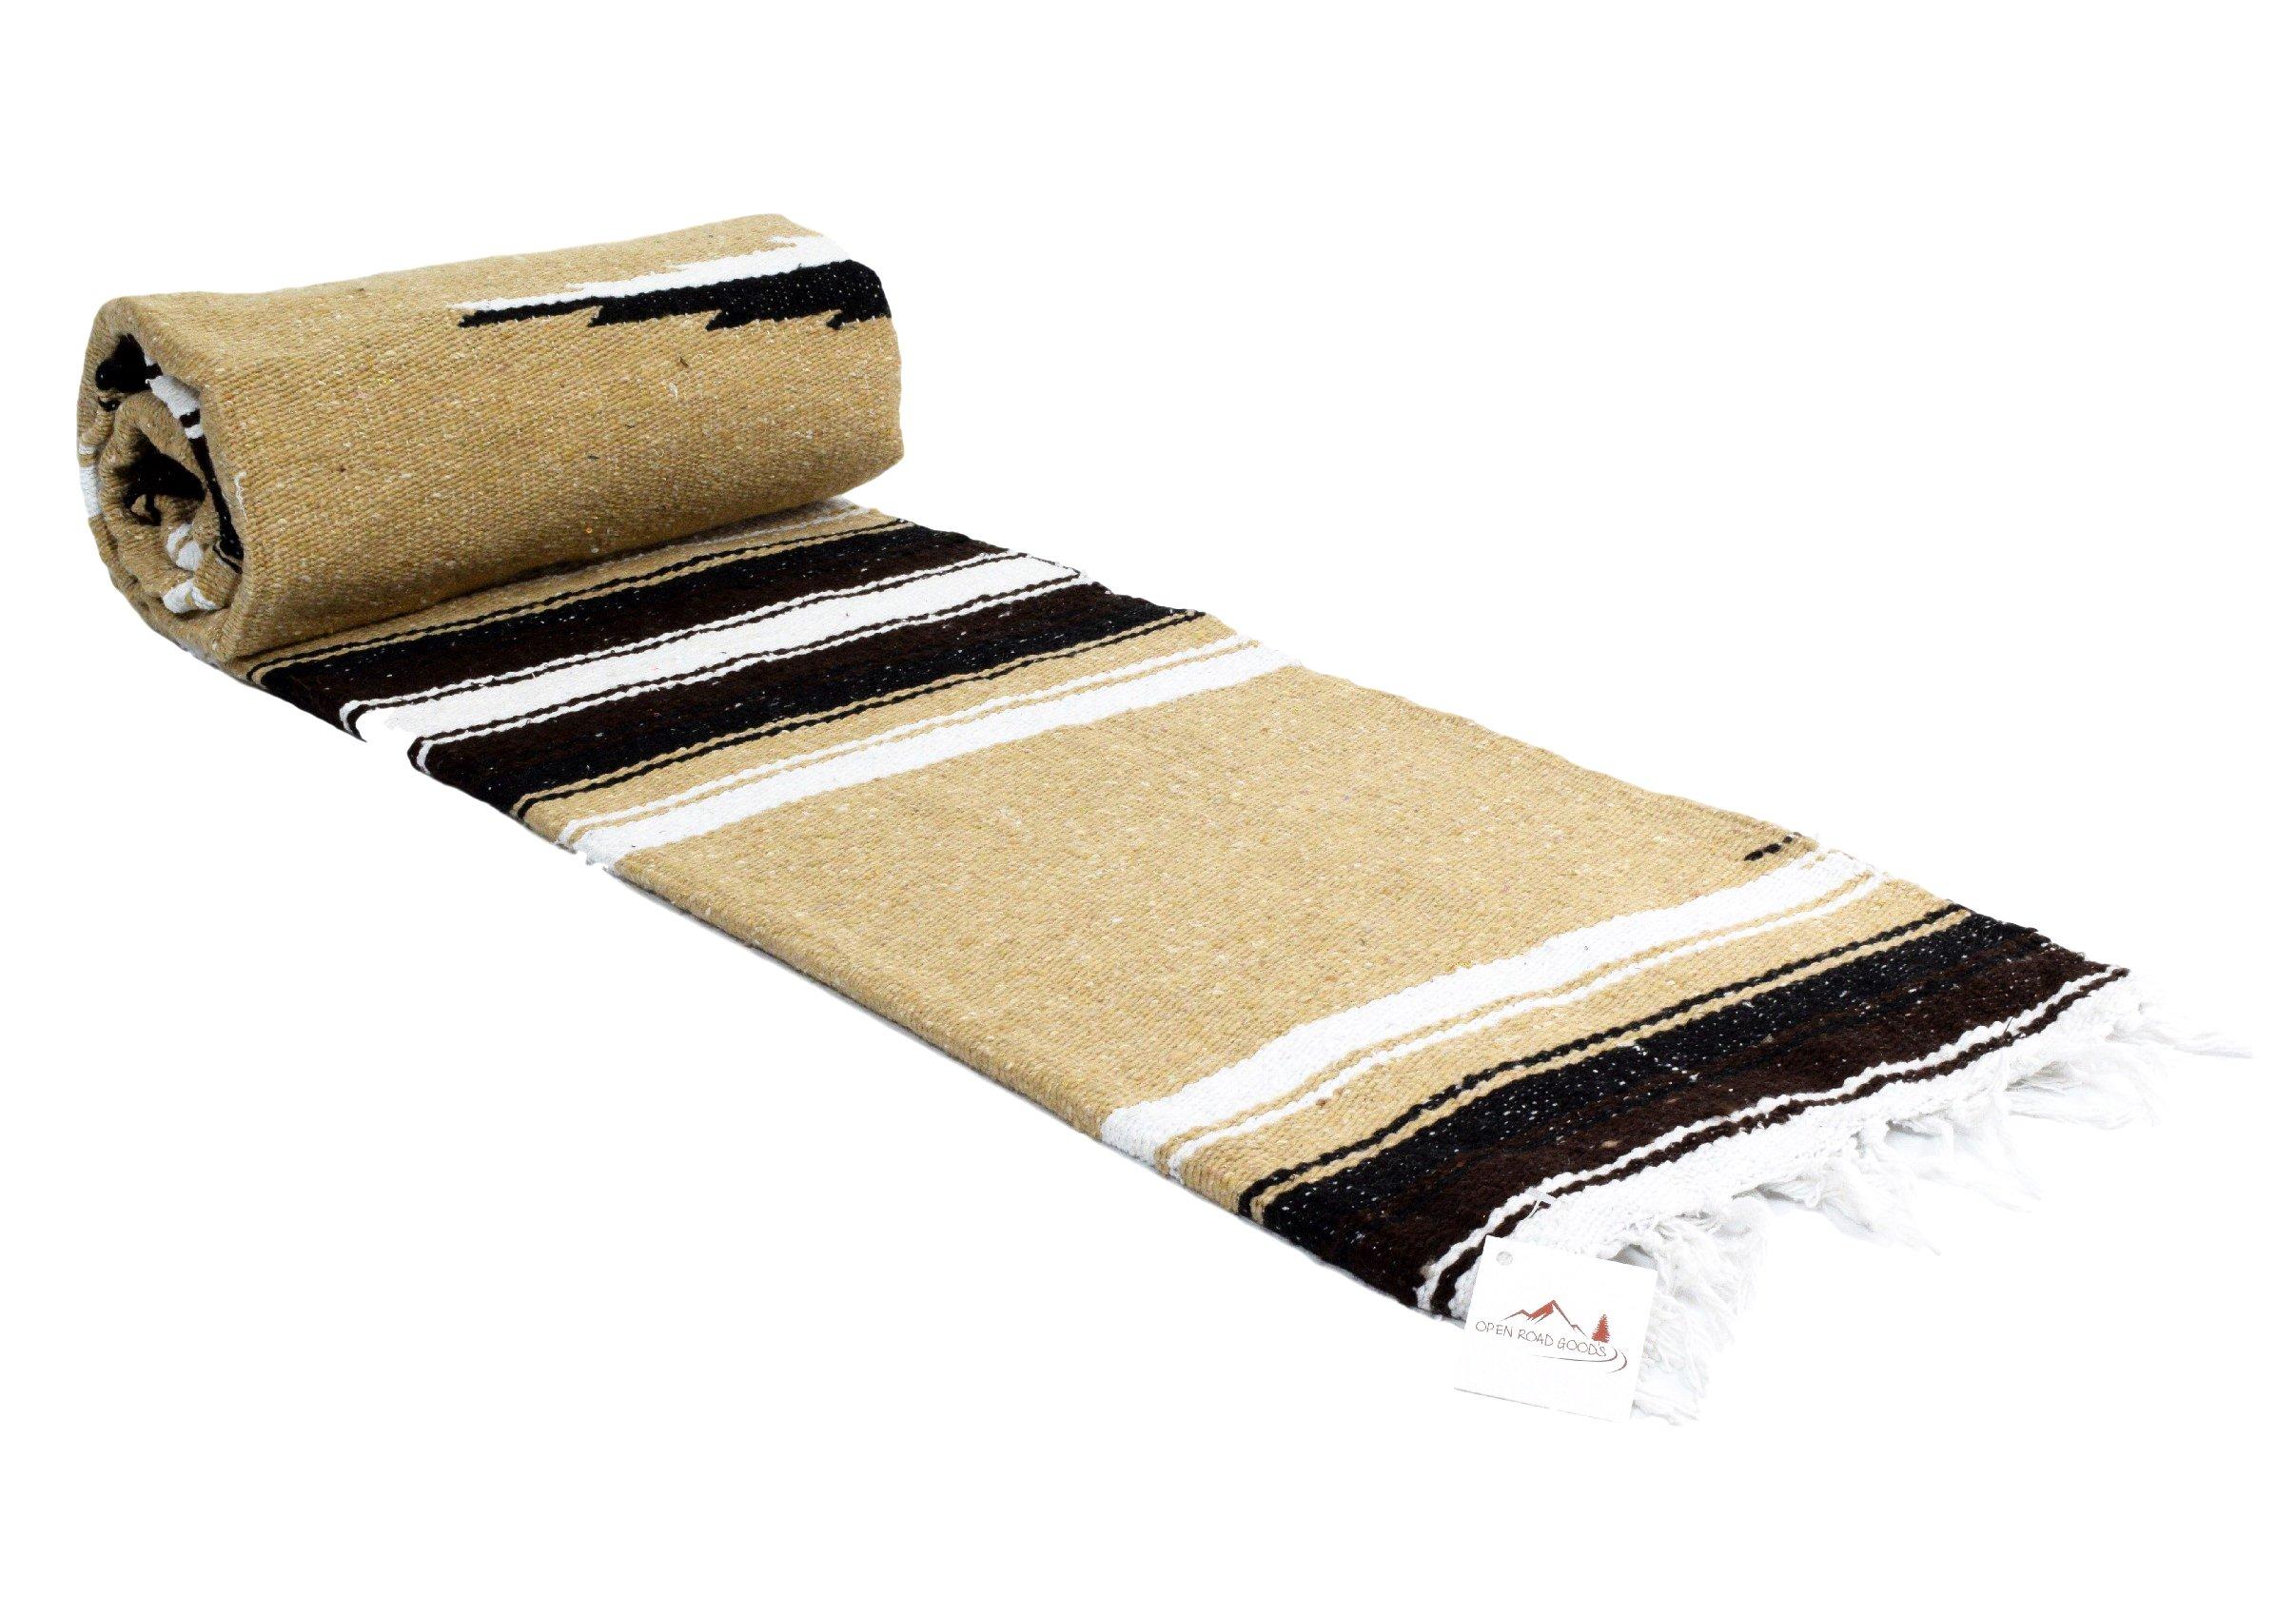 Open Road Goods Tan/Khaki/Brown Thick Diamond Mexican Navajo Yoga Blanket, Extra Thick Serape with Black and White Stripes